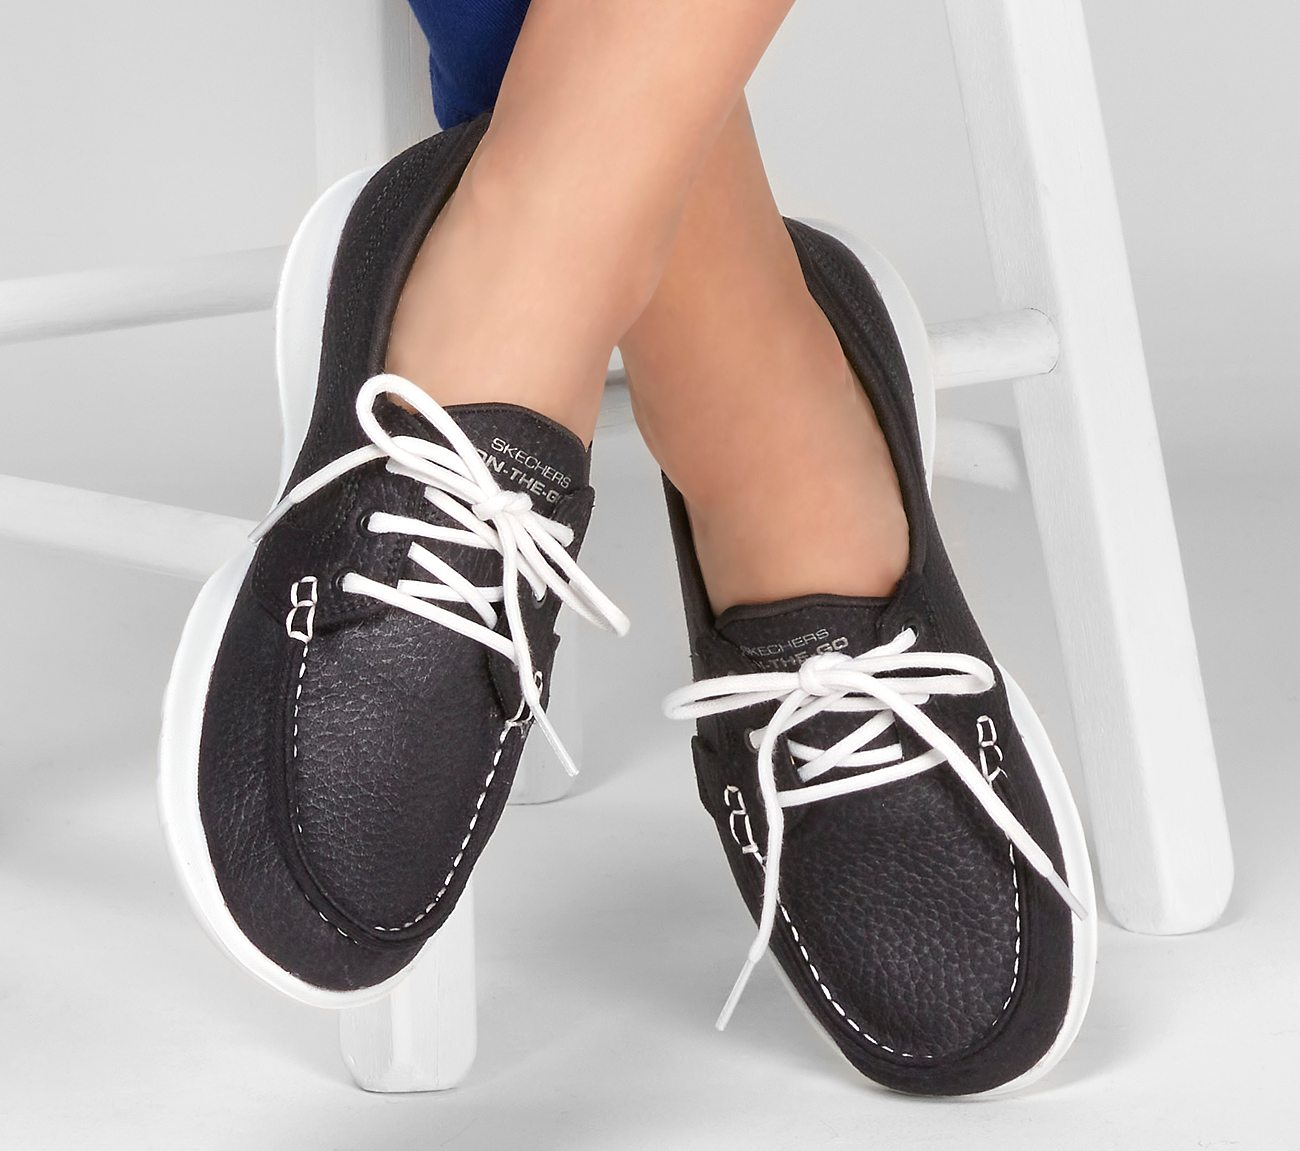 Skechers Go Walk Max Shoes for Men (Black 42 EU) : Buy